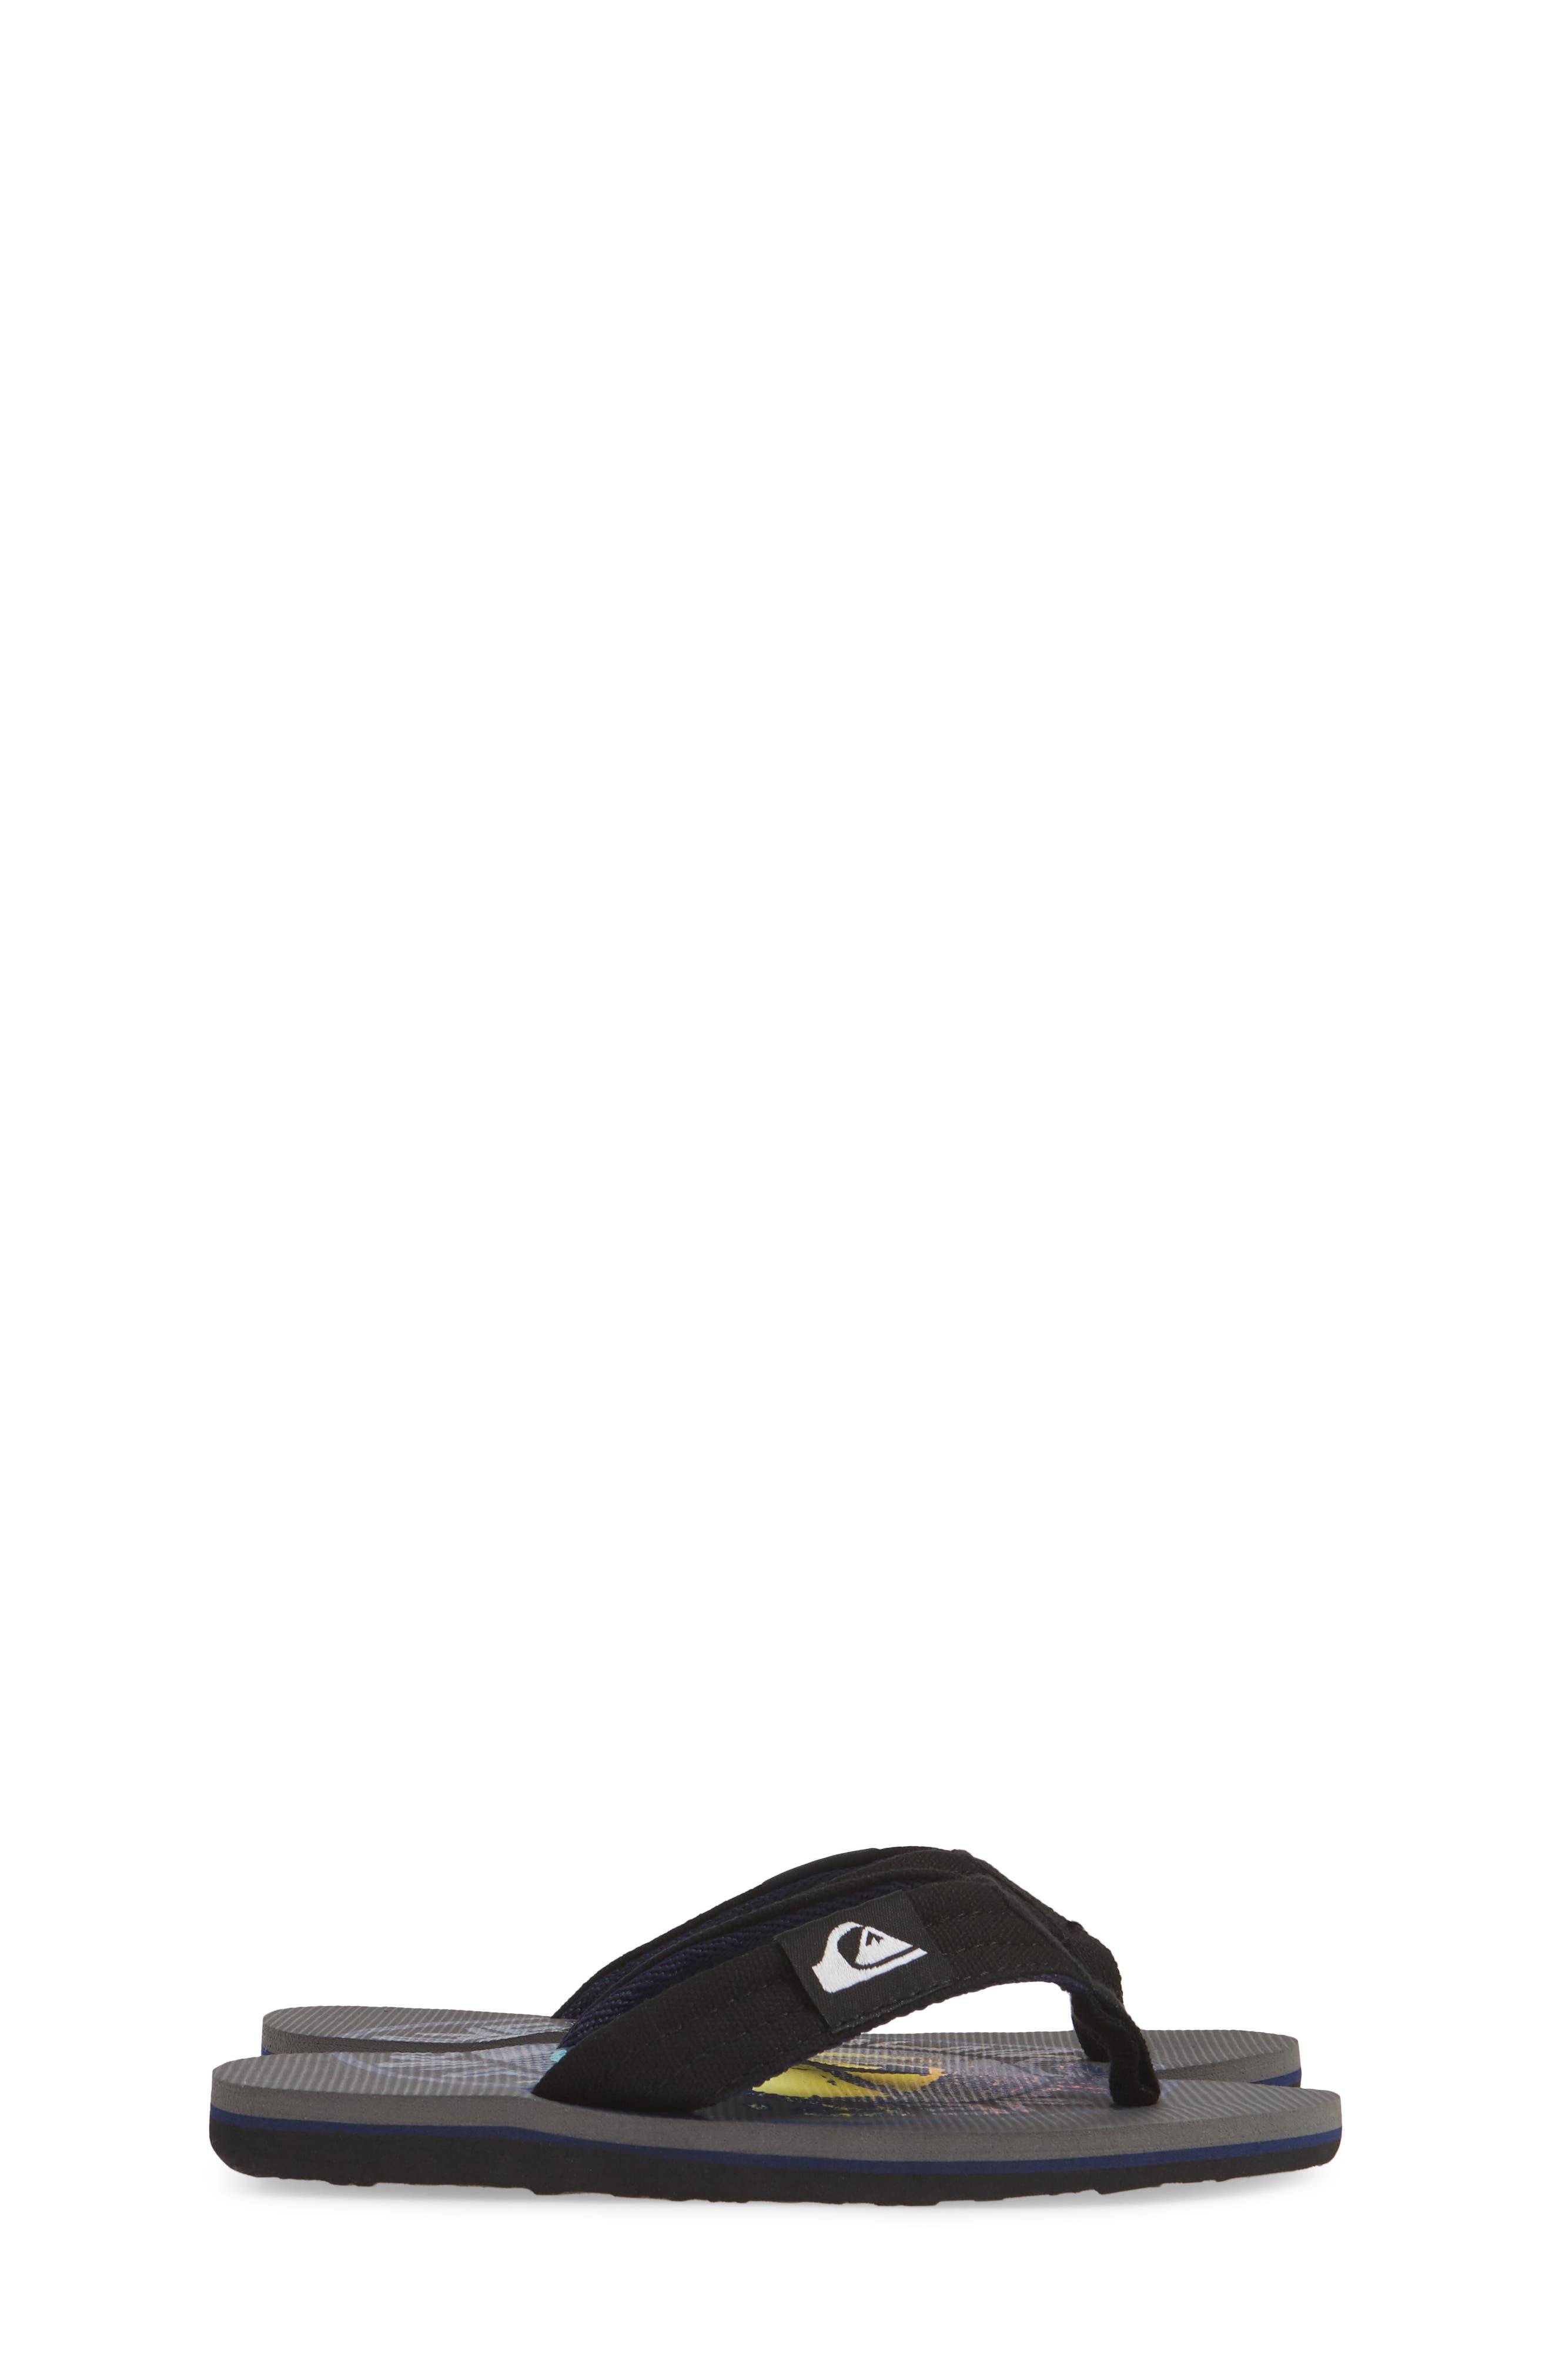 QUIKSILVER, Molokai Layback Flip Flop, Alternate thumbnail 4, color, GREY/ BLACK/ BLUE